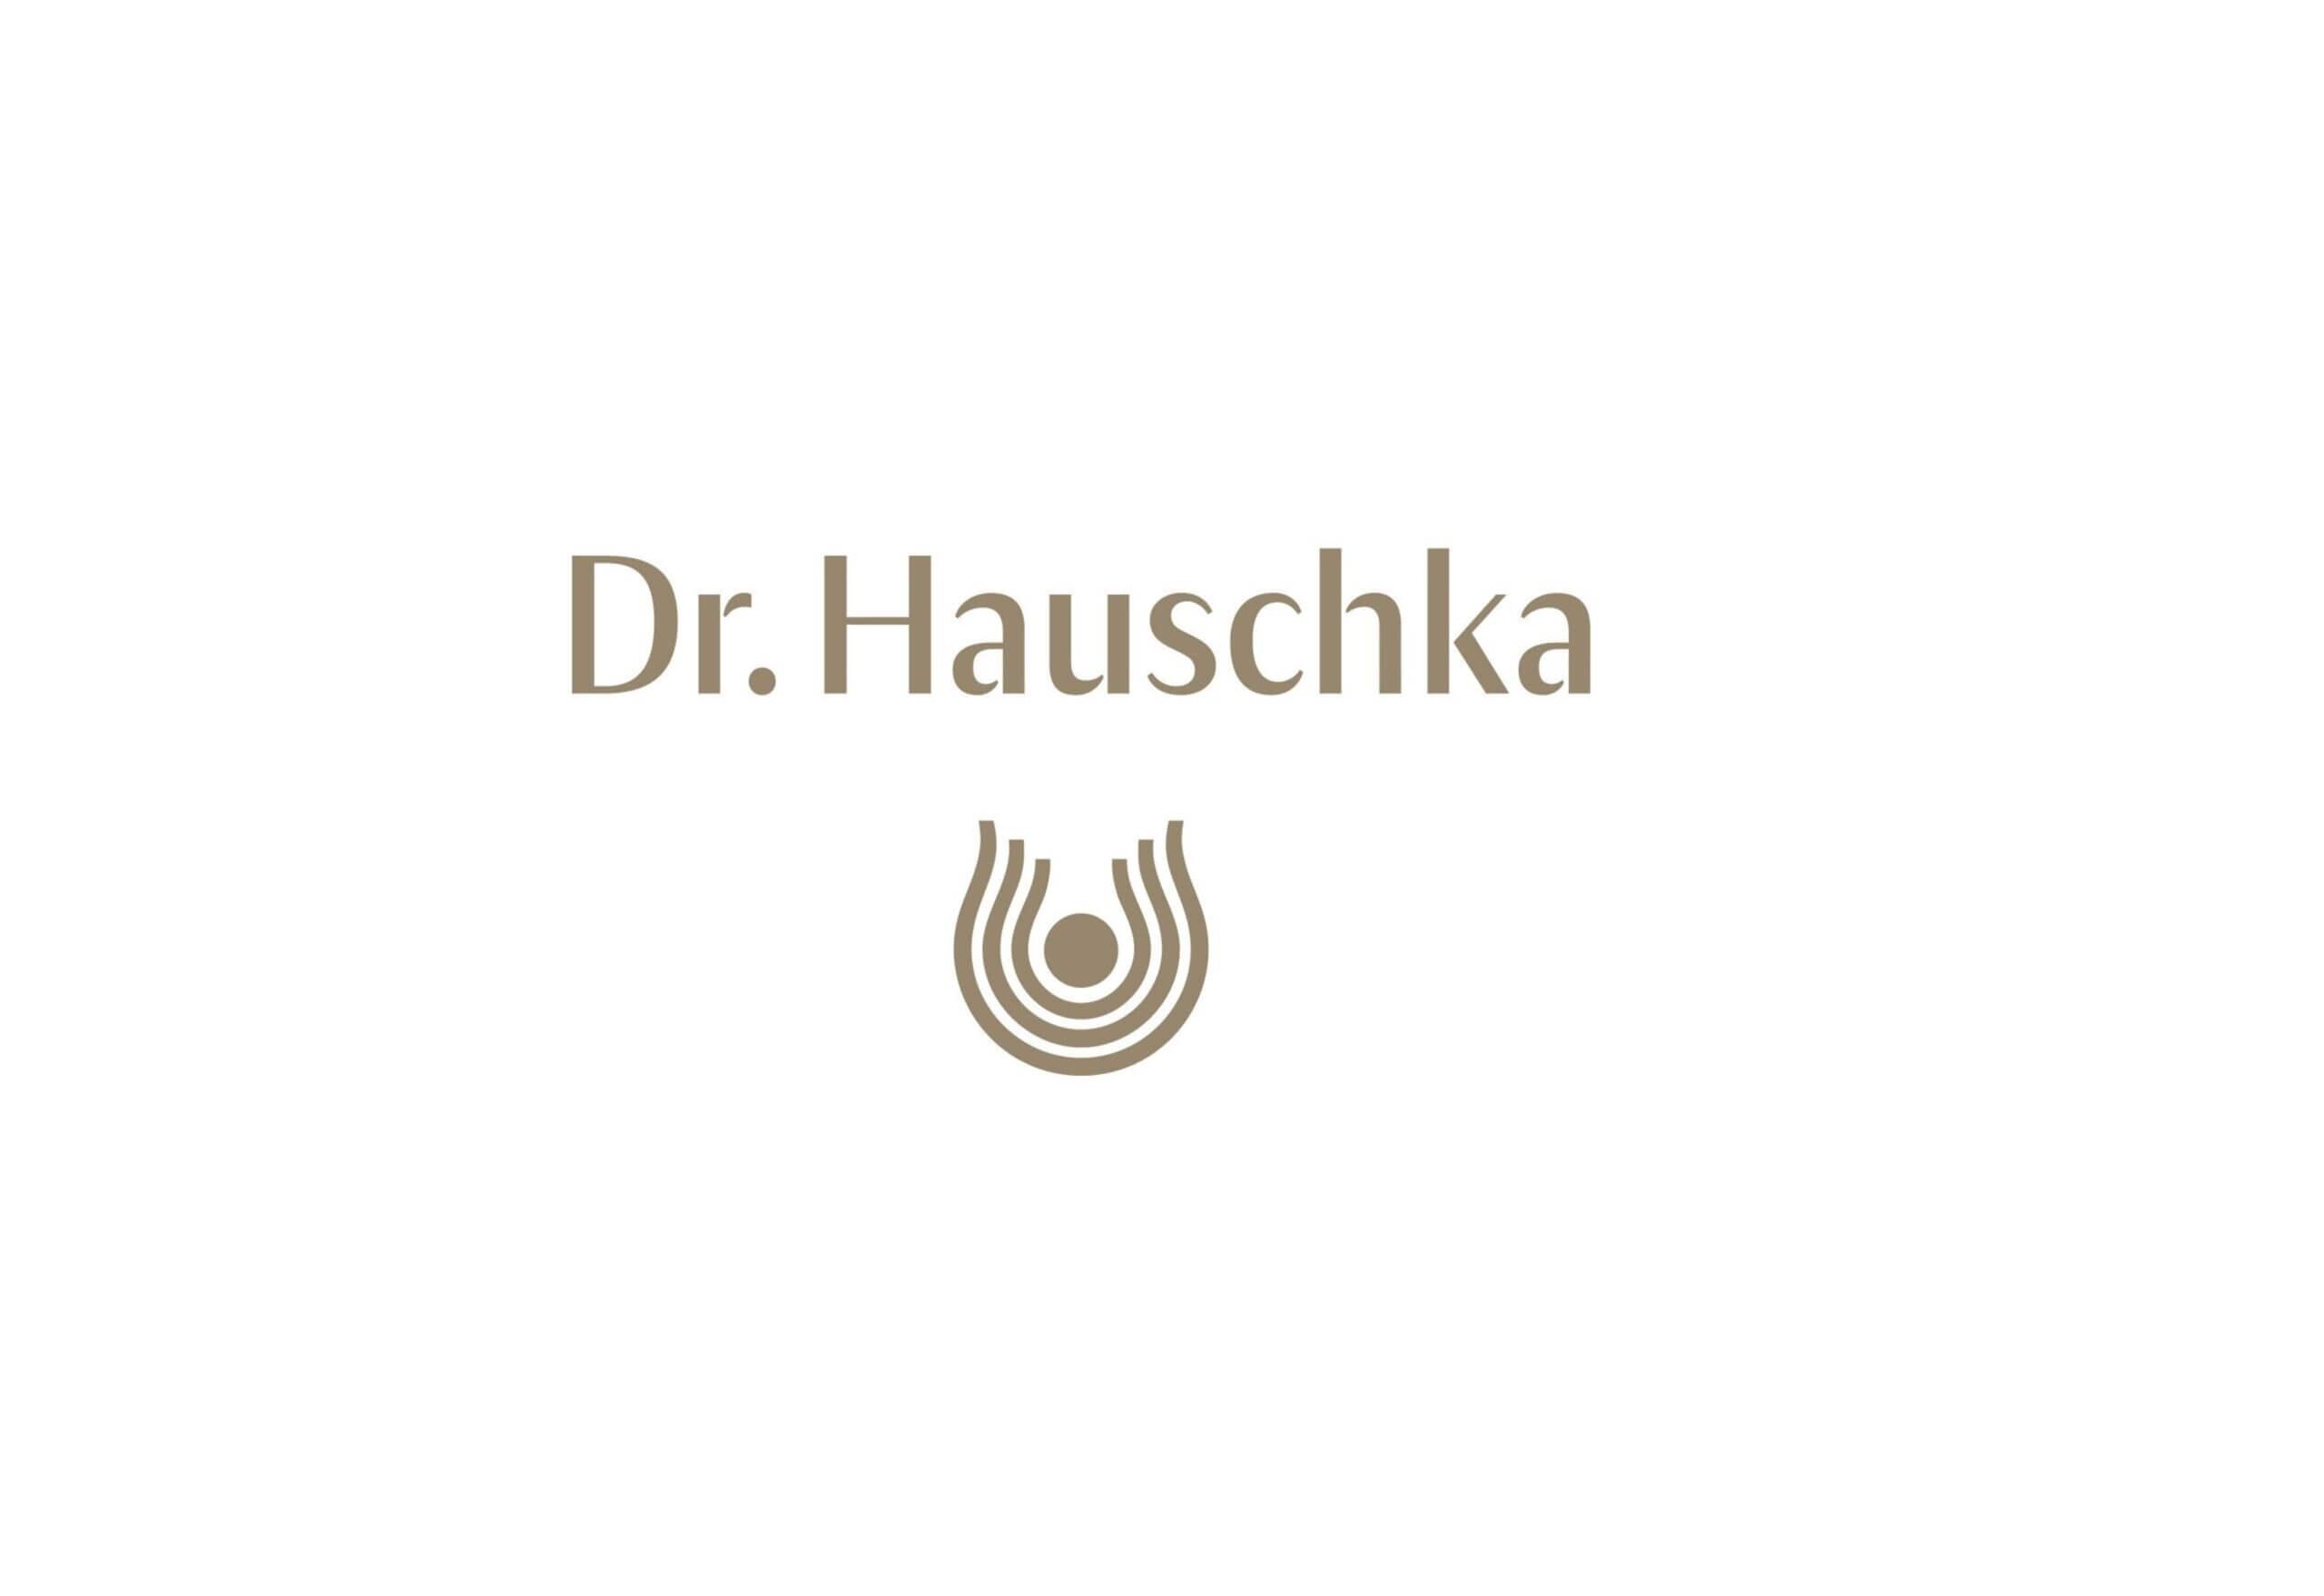 Is Dr. Hauschka Skin Care Cruelty-Free? | PETA